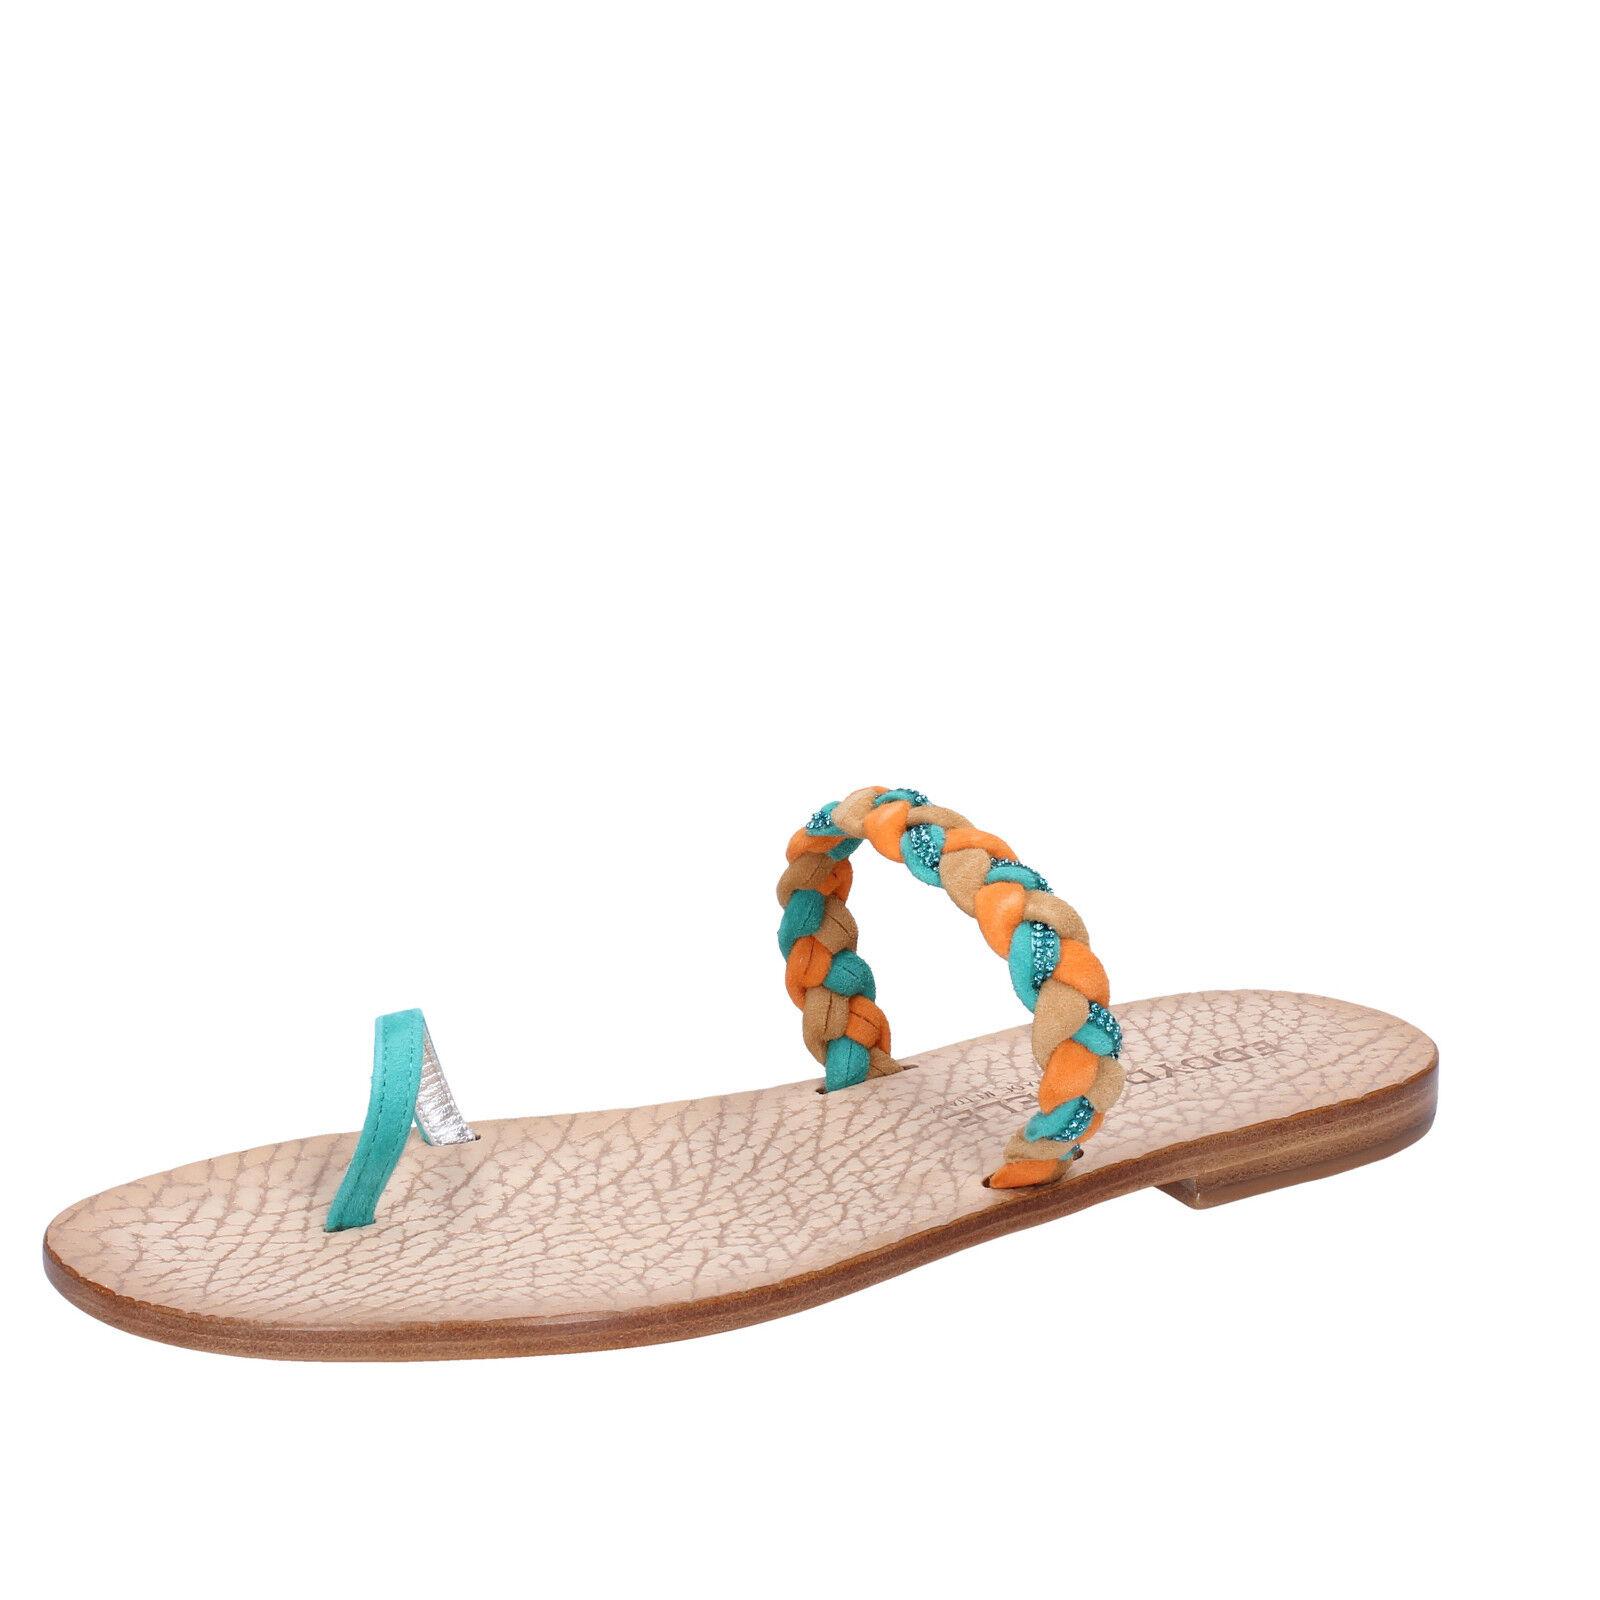 Damens's schuhe EDDY DANIELE 7 (EU 37) Sandale multicolor suede swarovski AX716-37